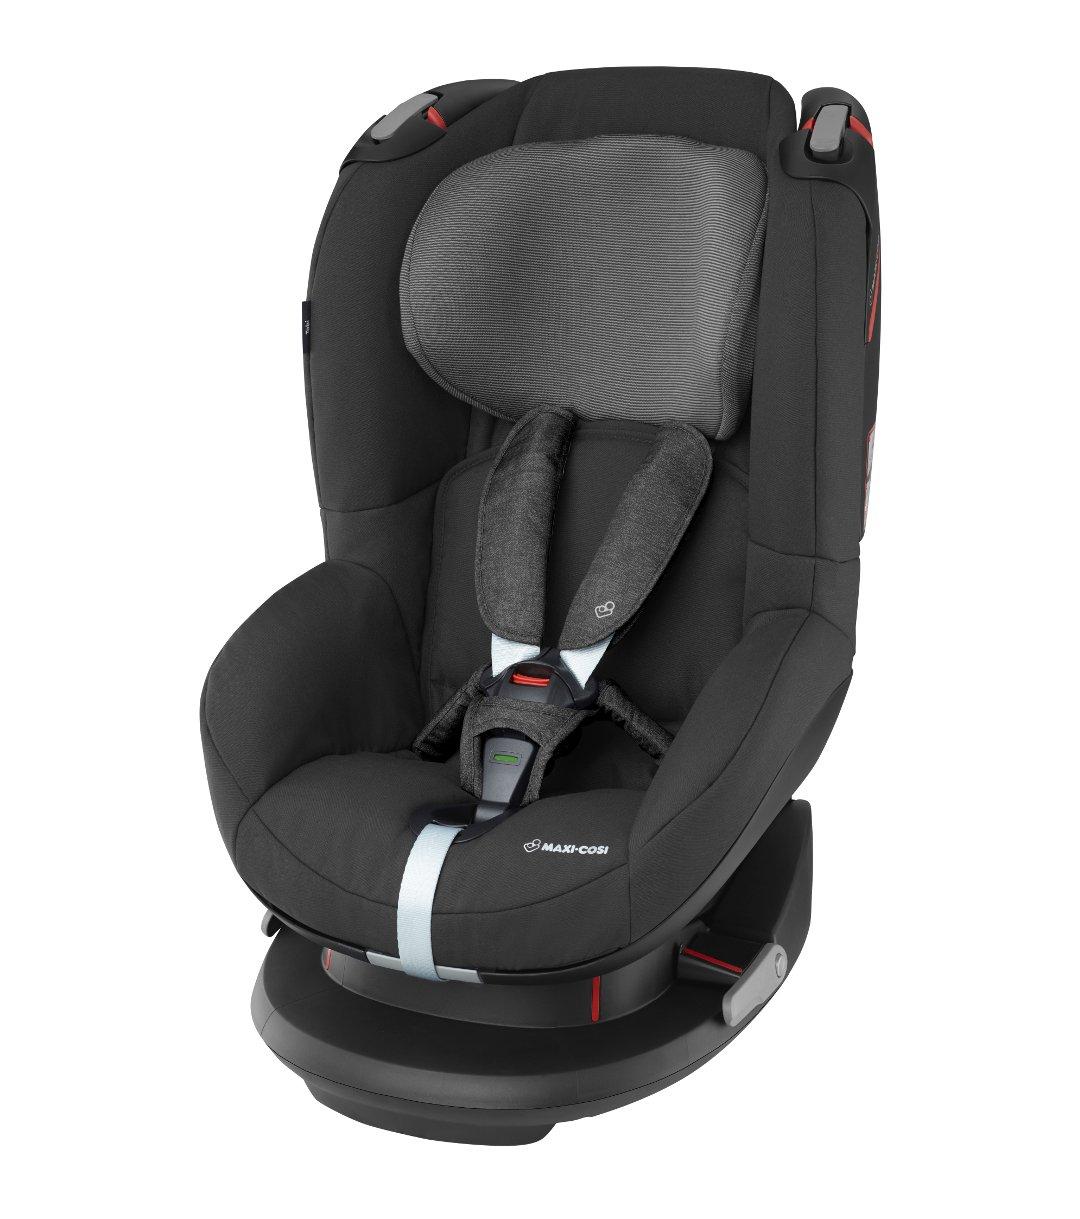 Bērnu autosēdeklis 9-18 kg MAXI-COSI Tobi Nomad Black